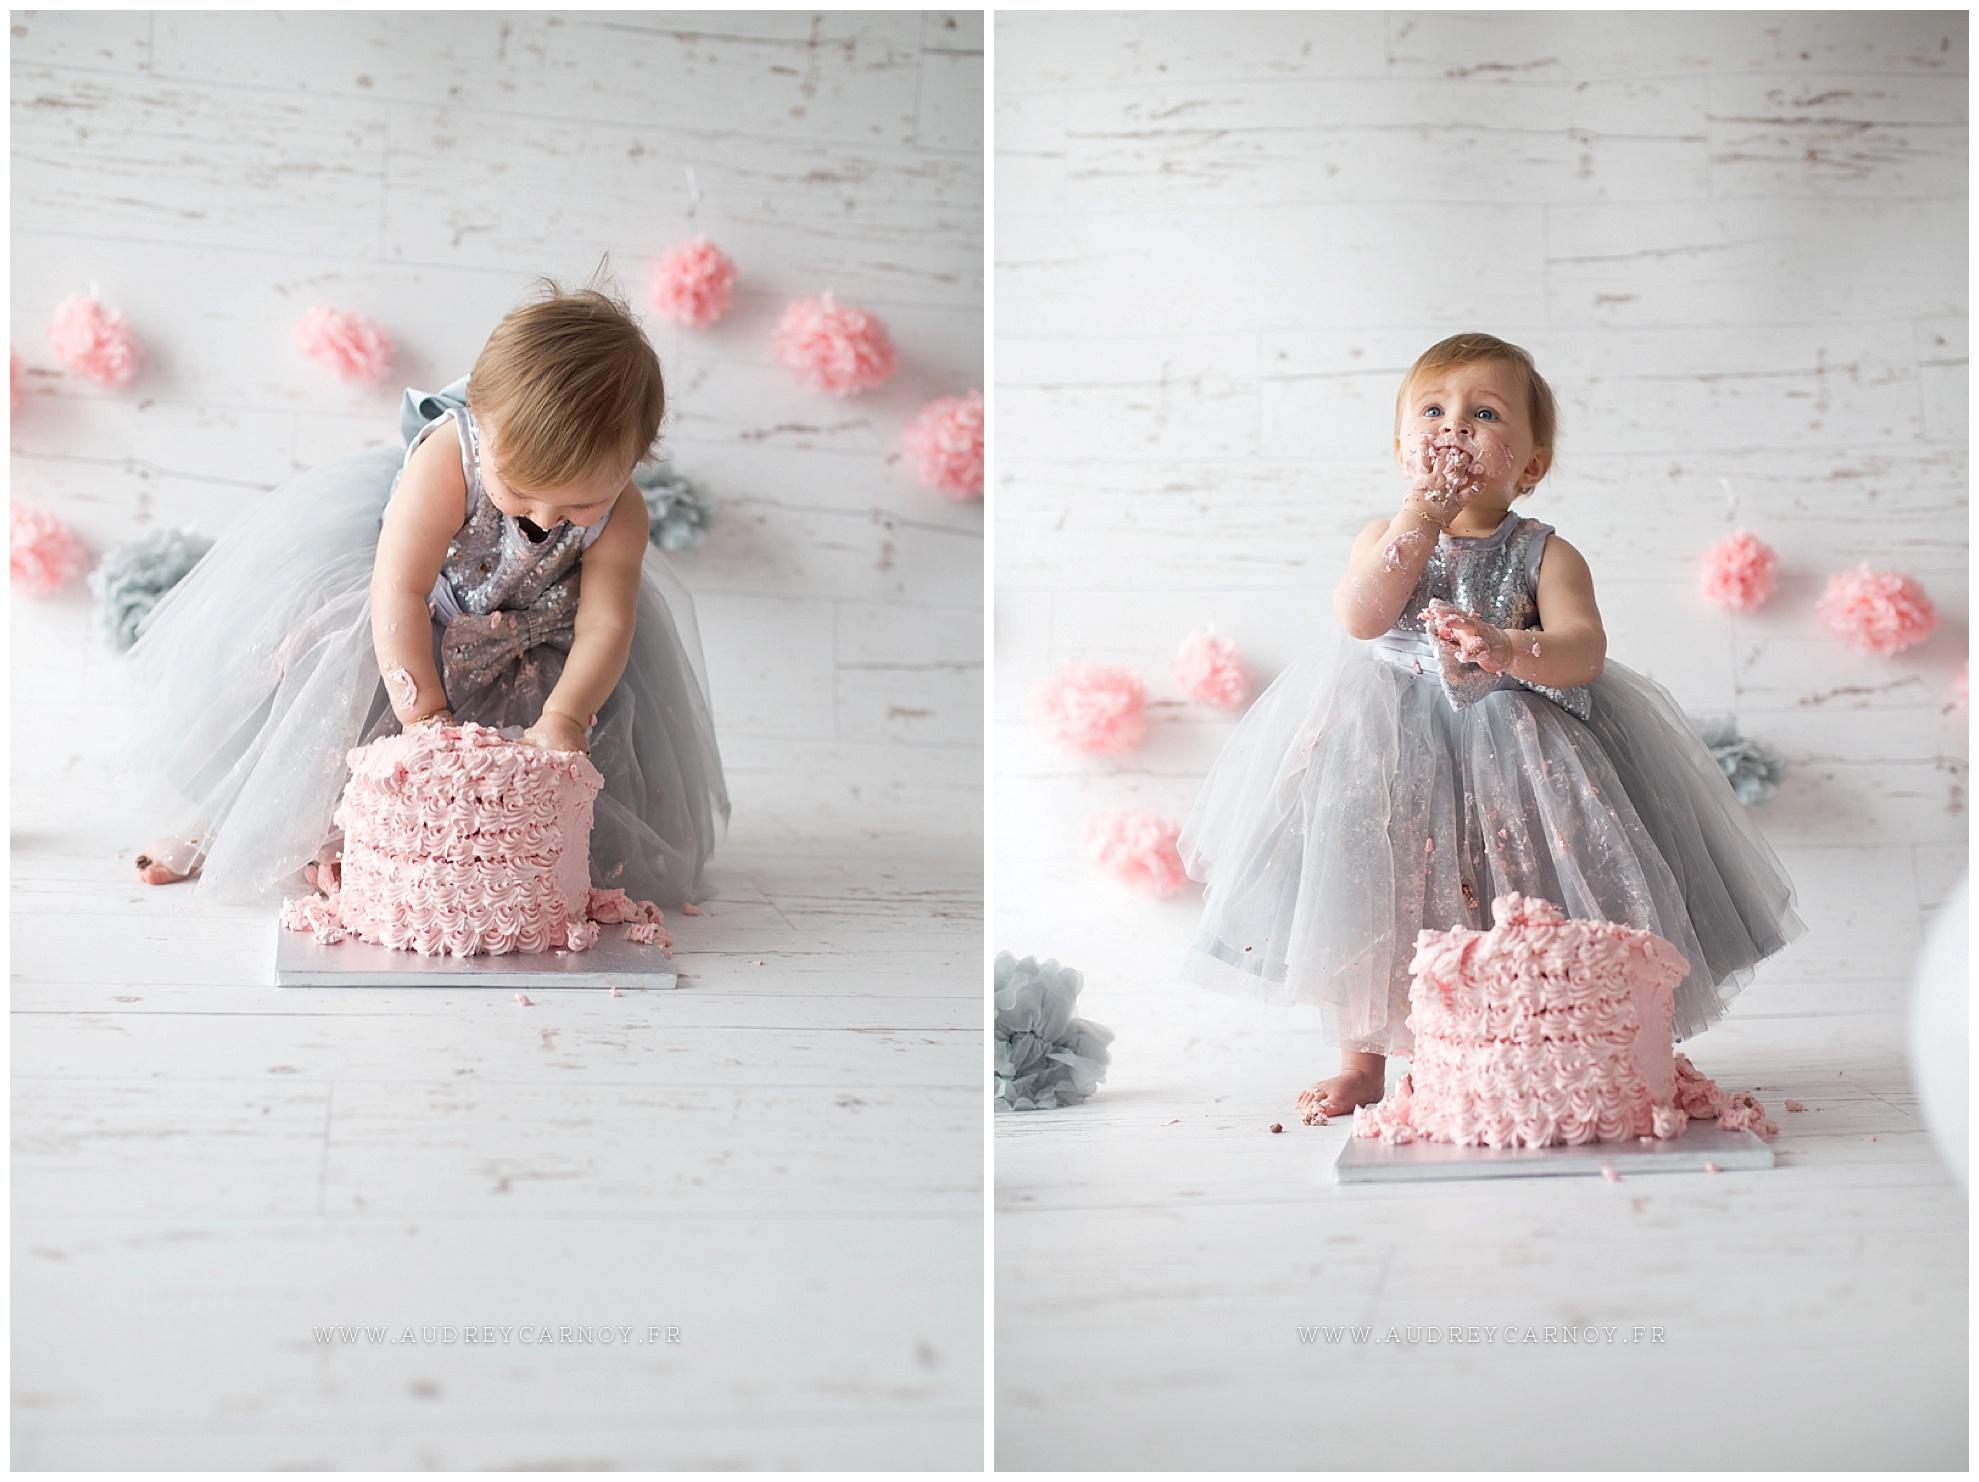 Smash the cake | Léana, 1 an 37